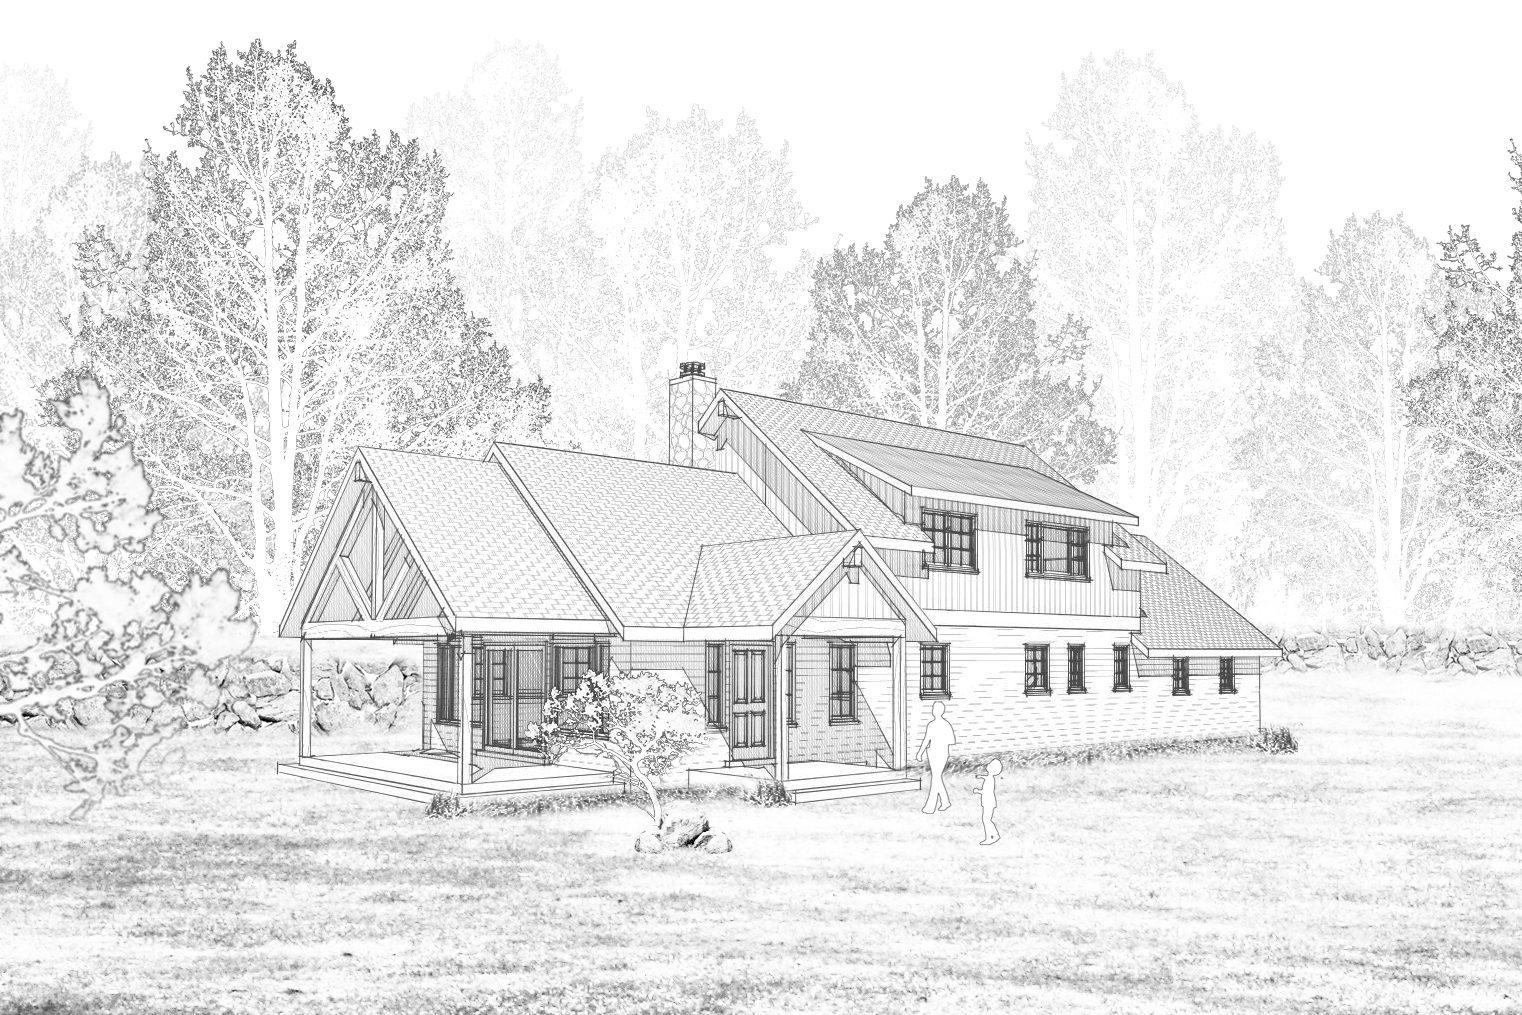 Mcgregor Sketch Rendering Shed Dormer Entry Gable Vaulted Truss Porch North View